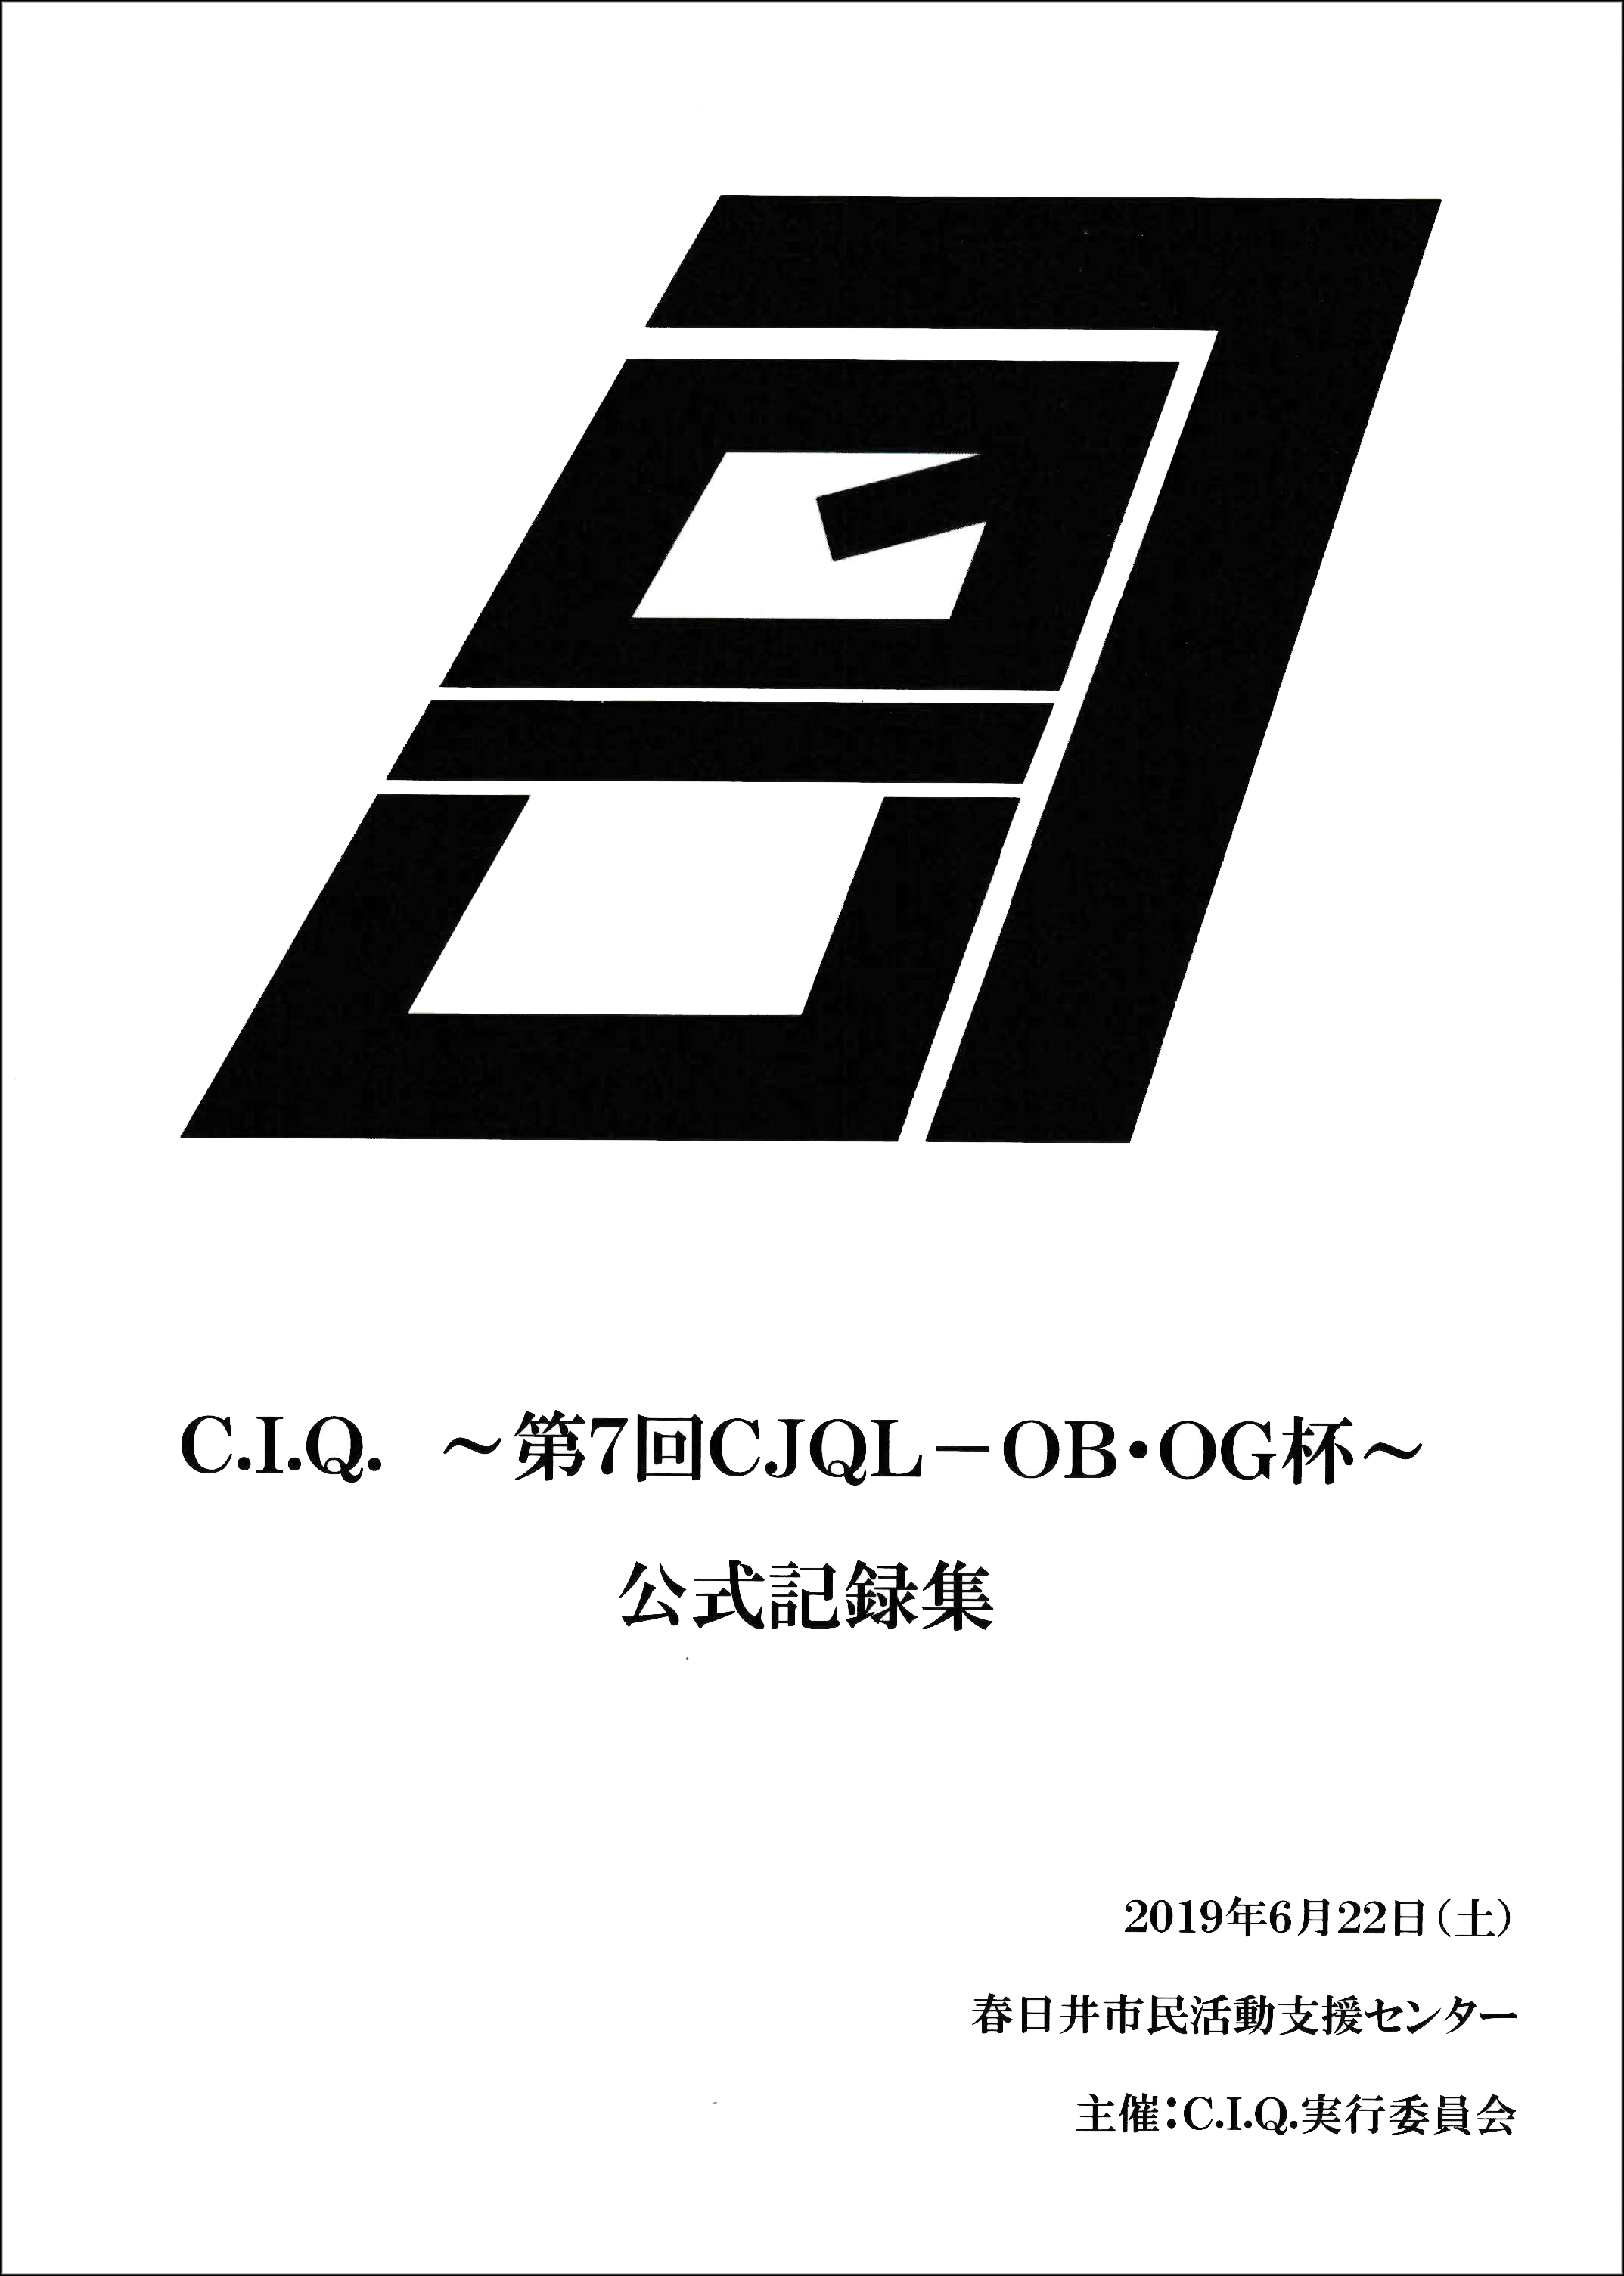 P11991638